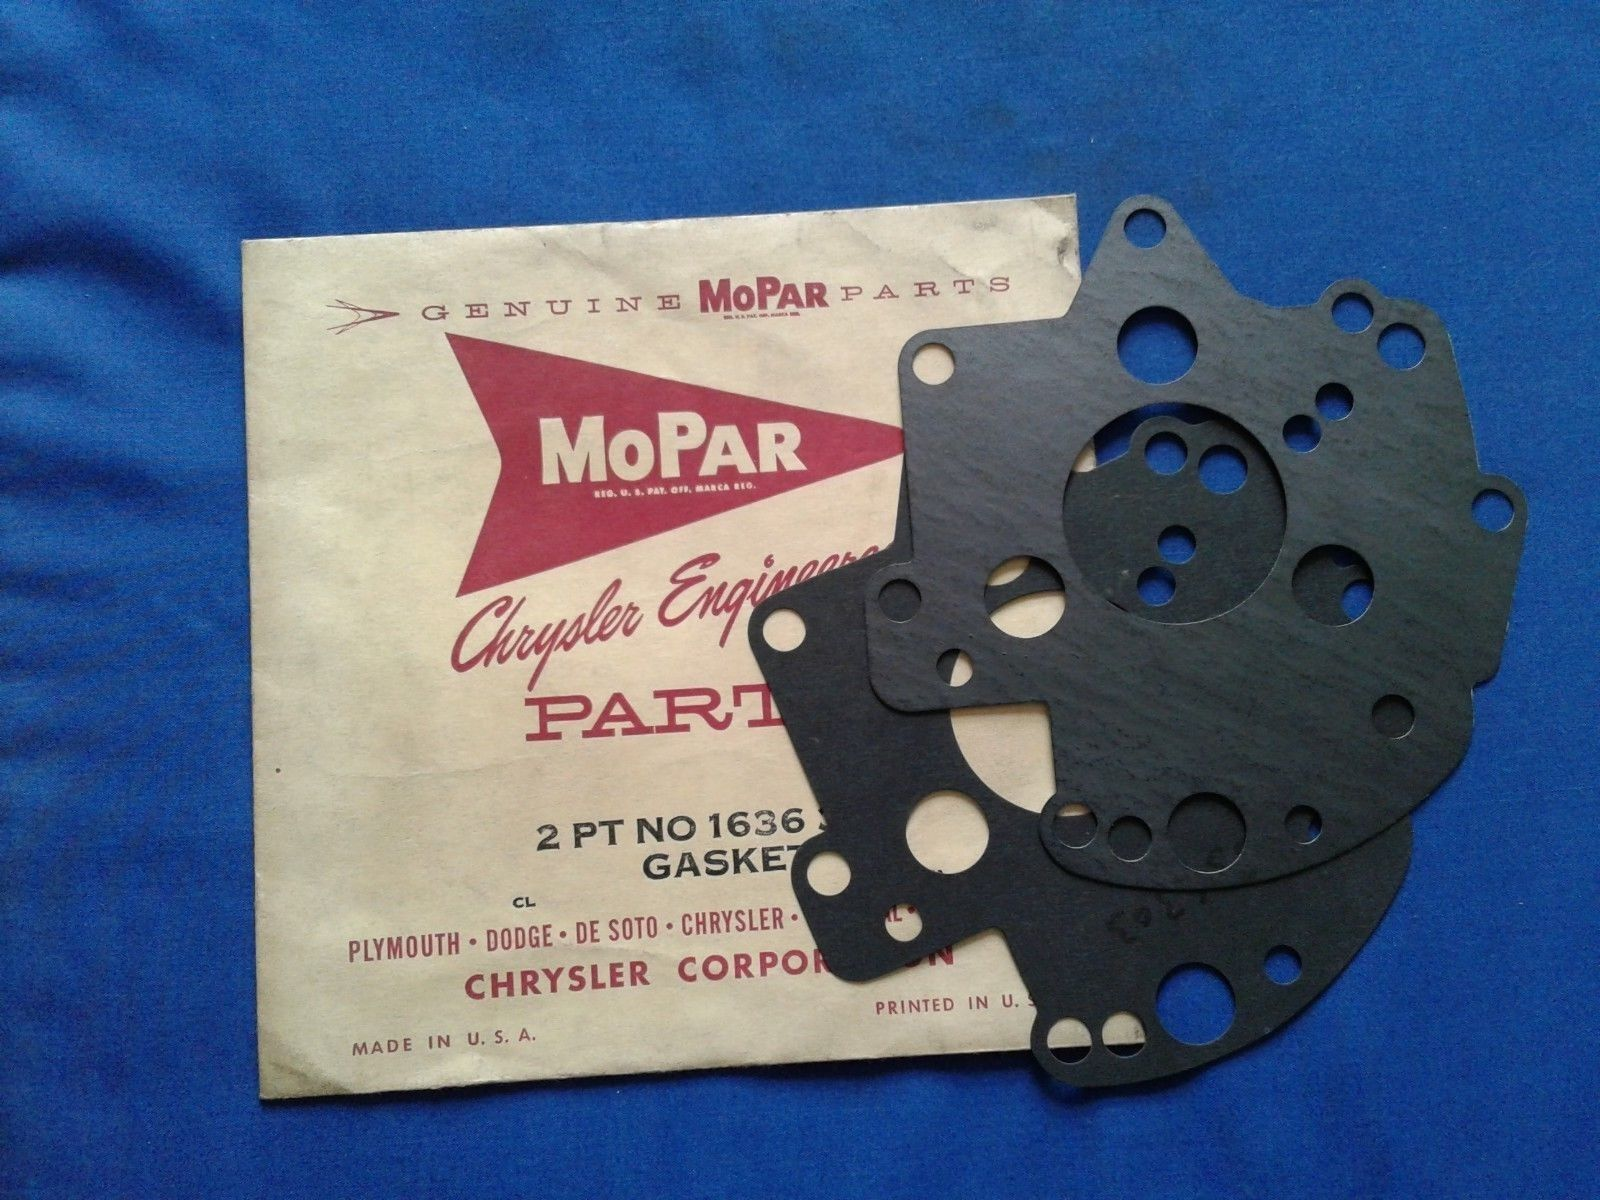 NOS Mopar Valve Body Automatic Transmission Gasket # 1636303, Set of 2